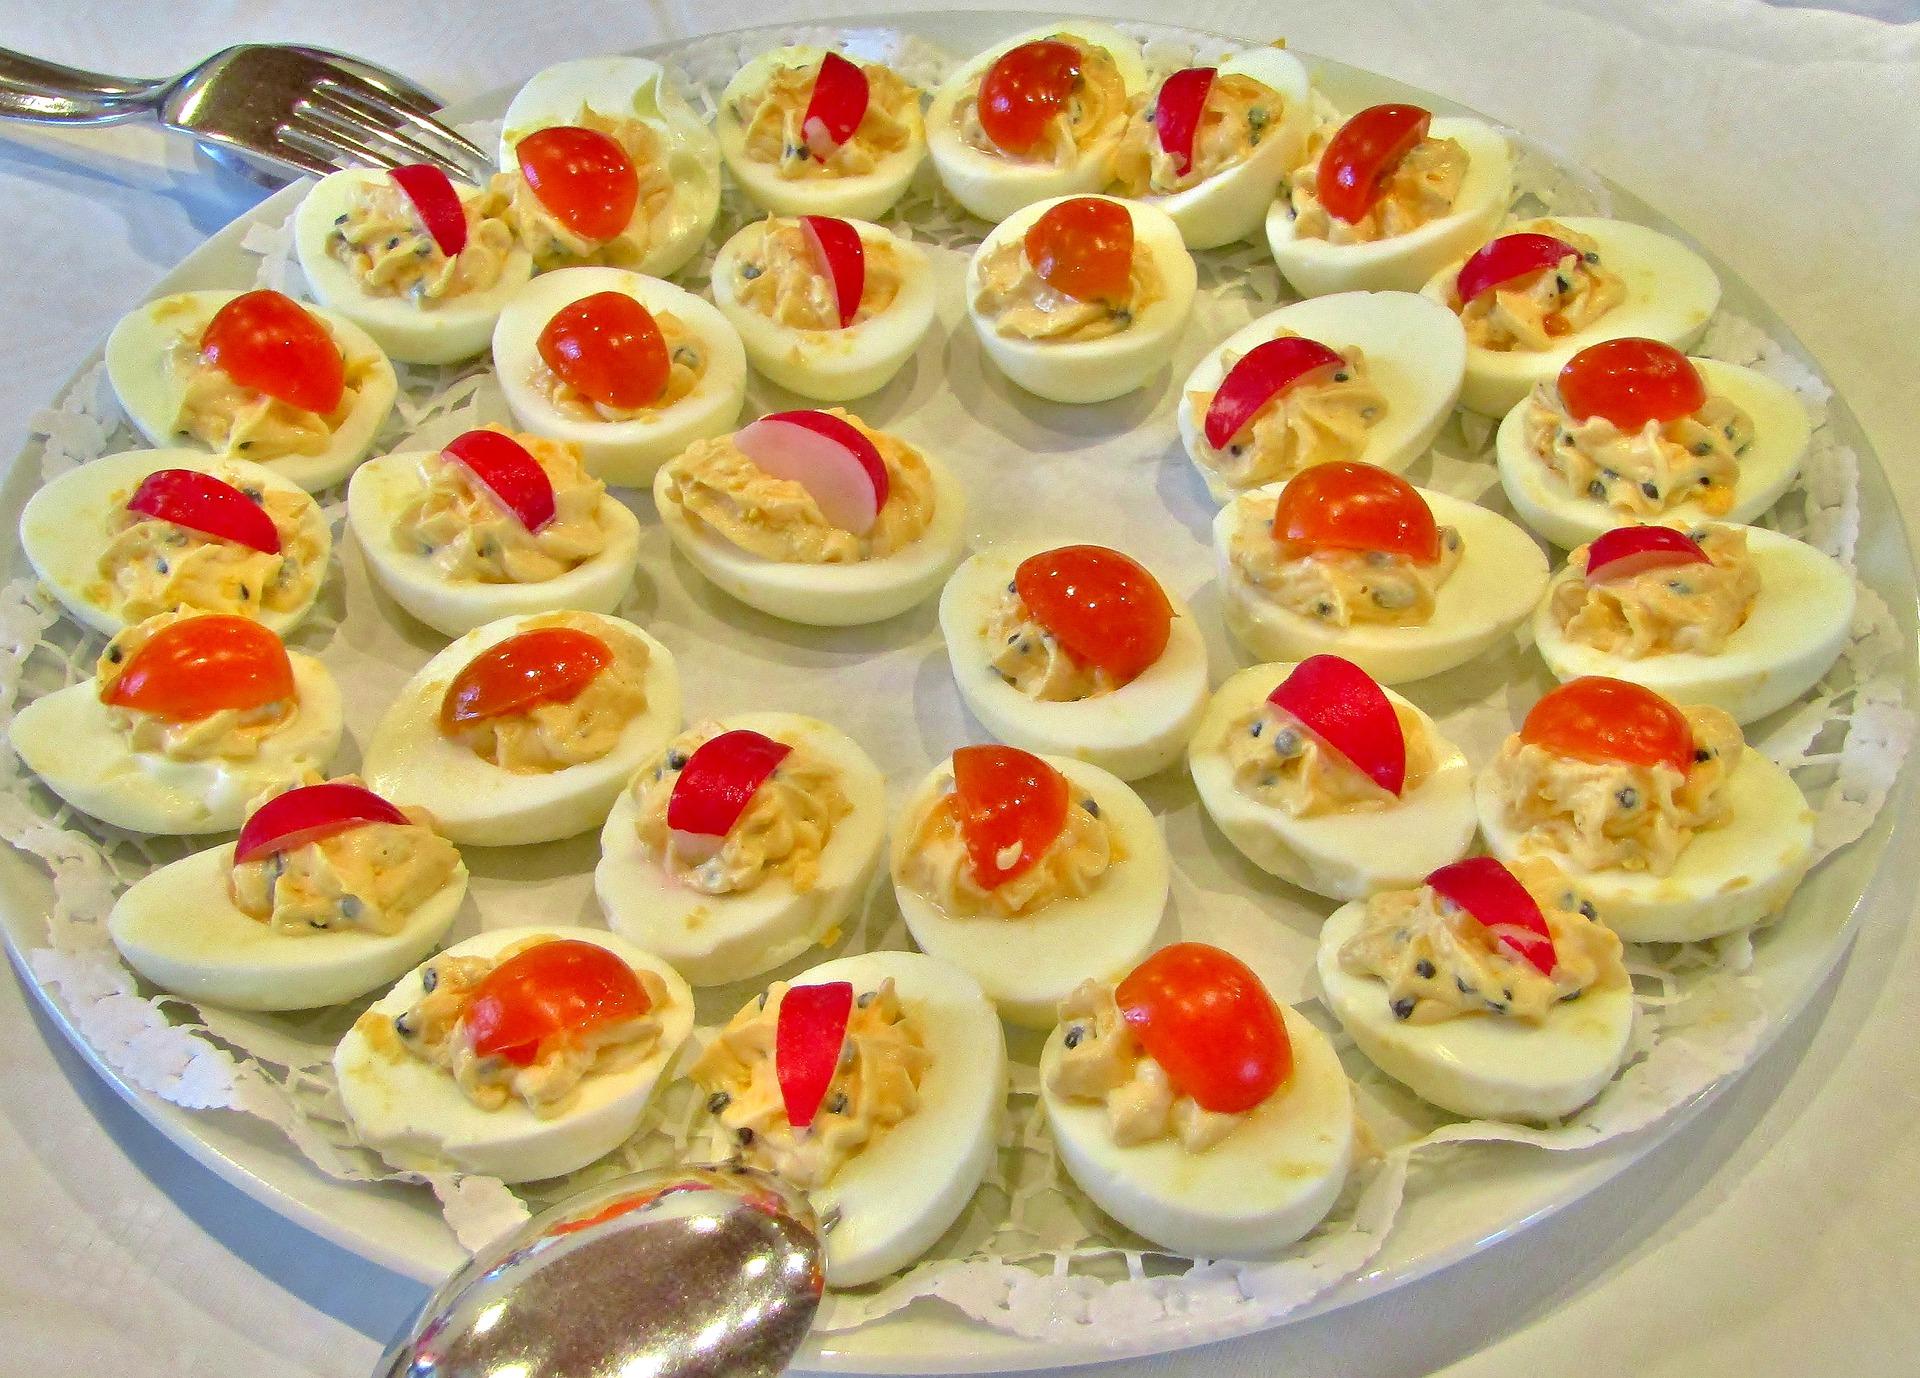 Russian Deviled Eggs Recipe (Stuffed Hard-boiled Eggs Recipe)